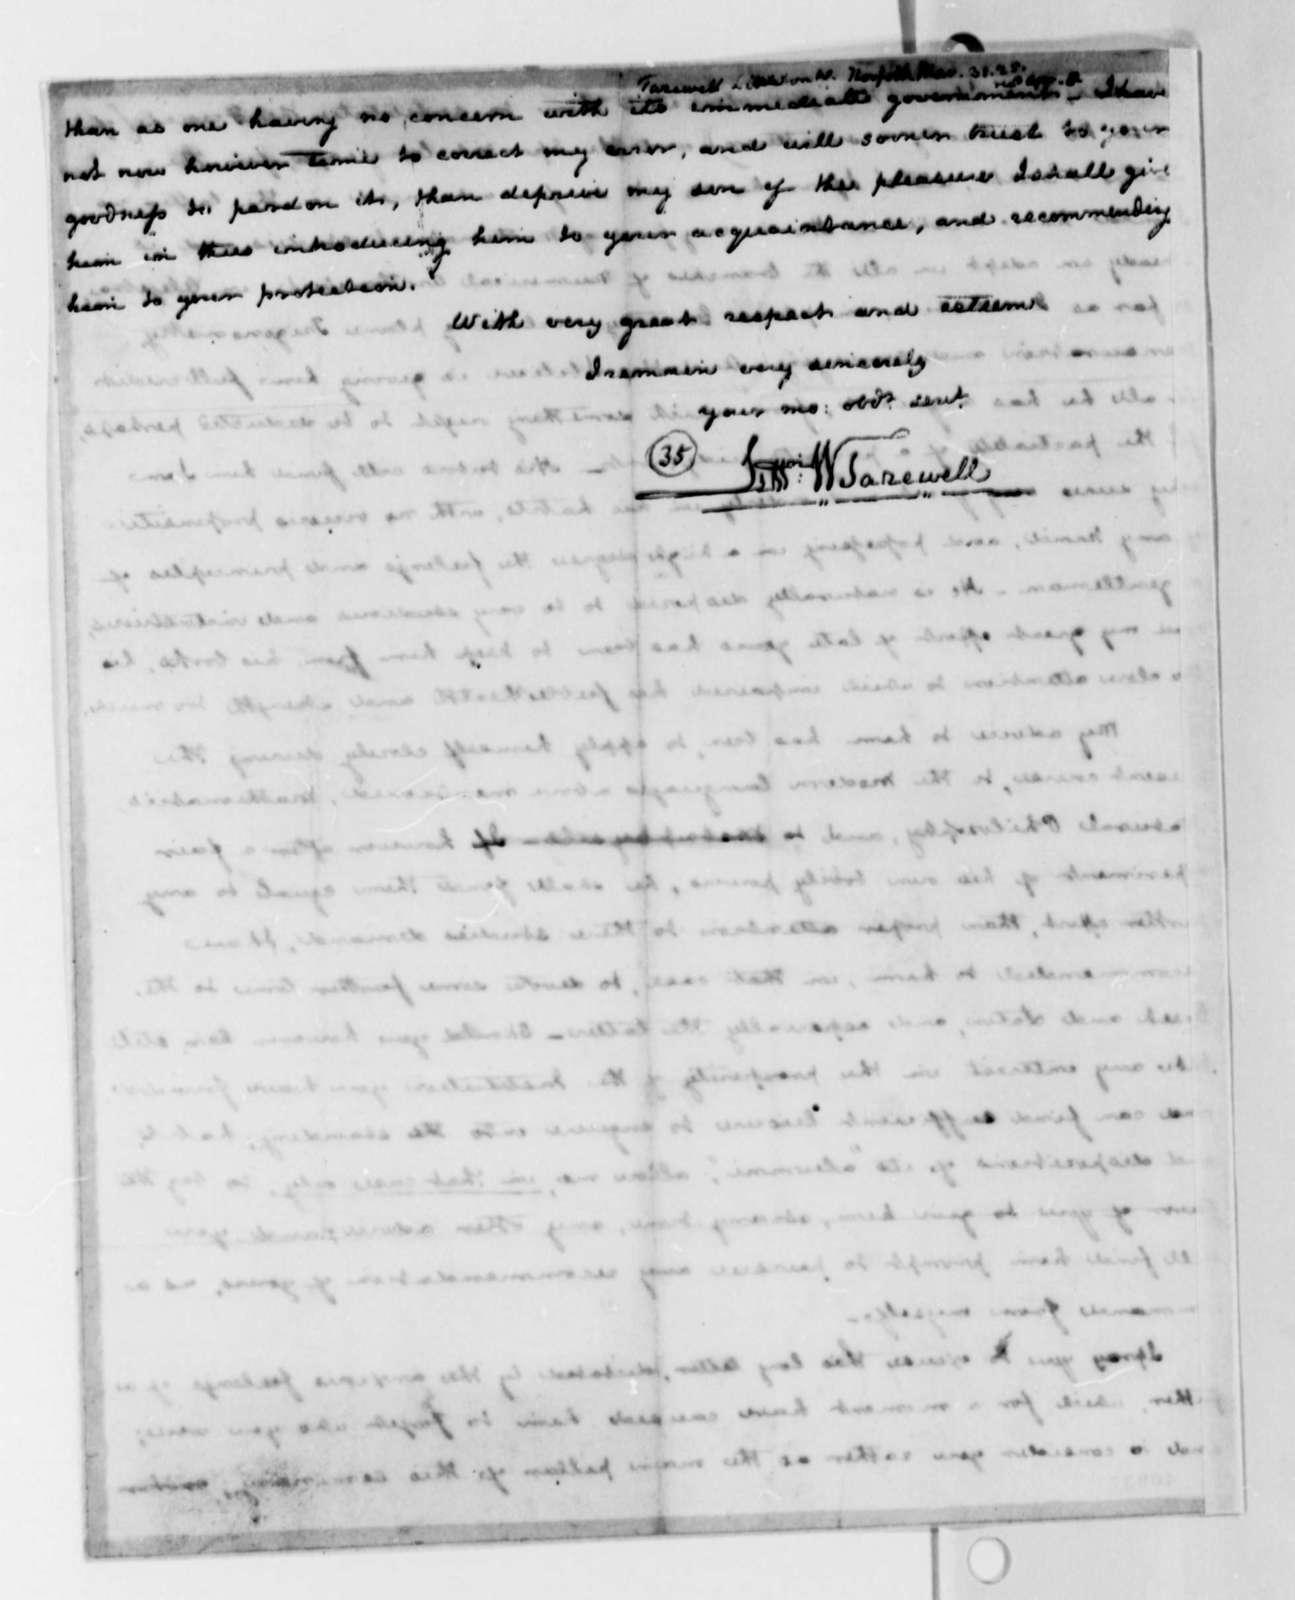 Littleton Waller Tazewell to Thomas Jefferson, March 31, 1825